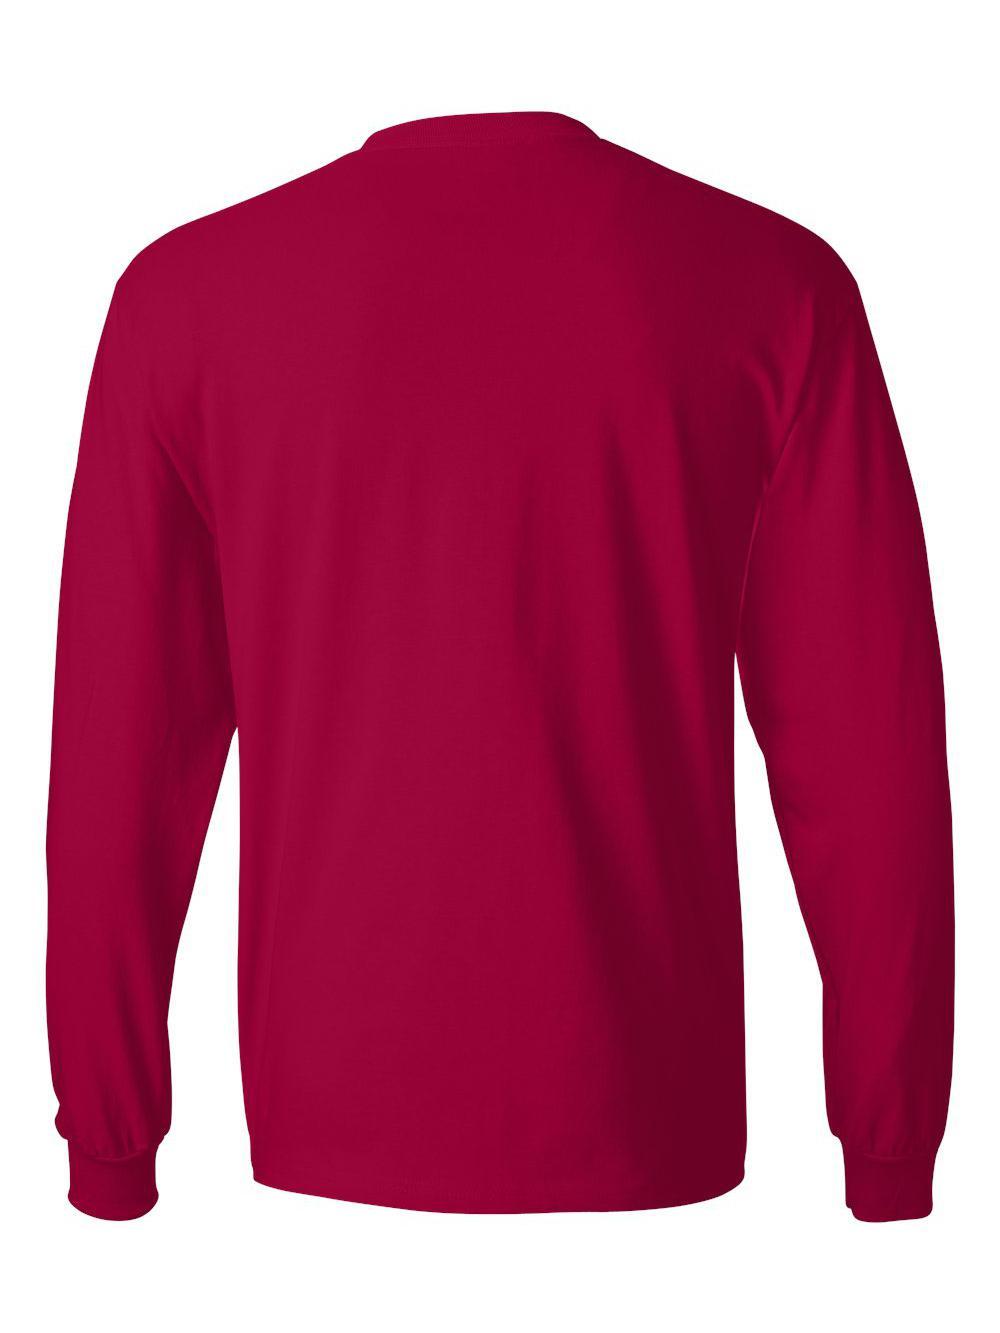 Hanes-Beefy-T-Long-Sleeve-T-Shirt-5186 thumbnail 28